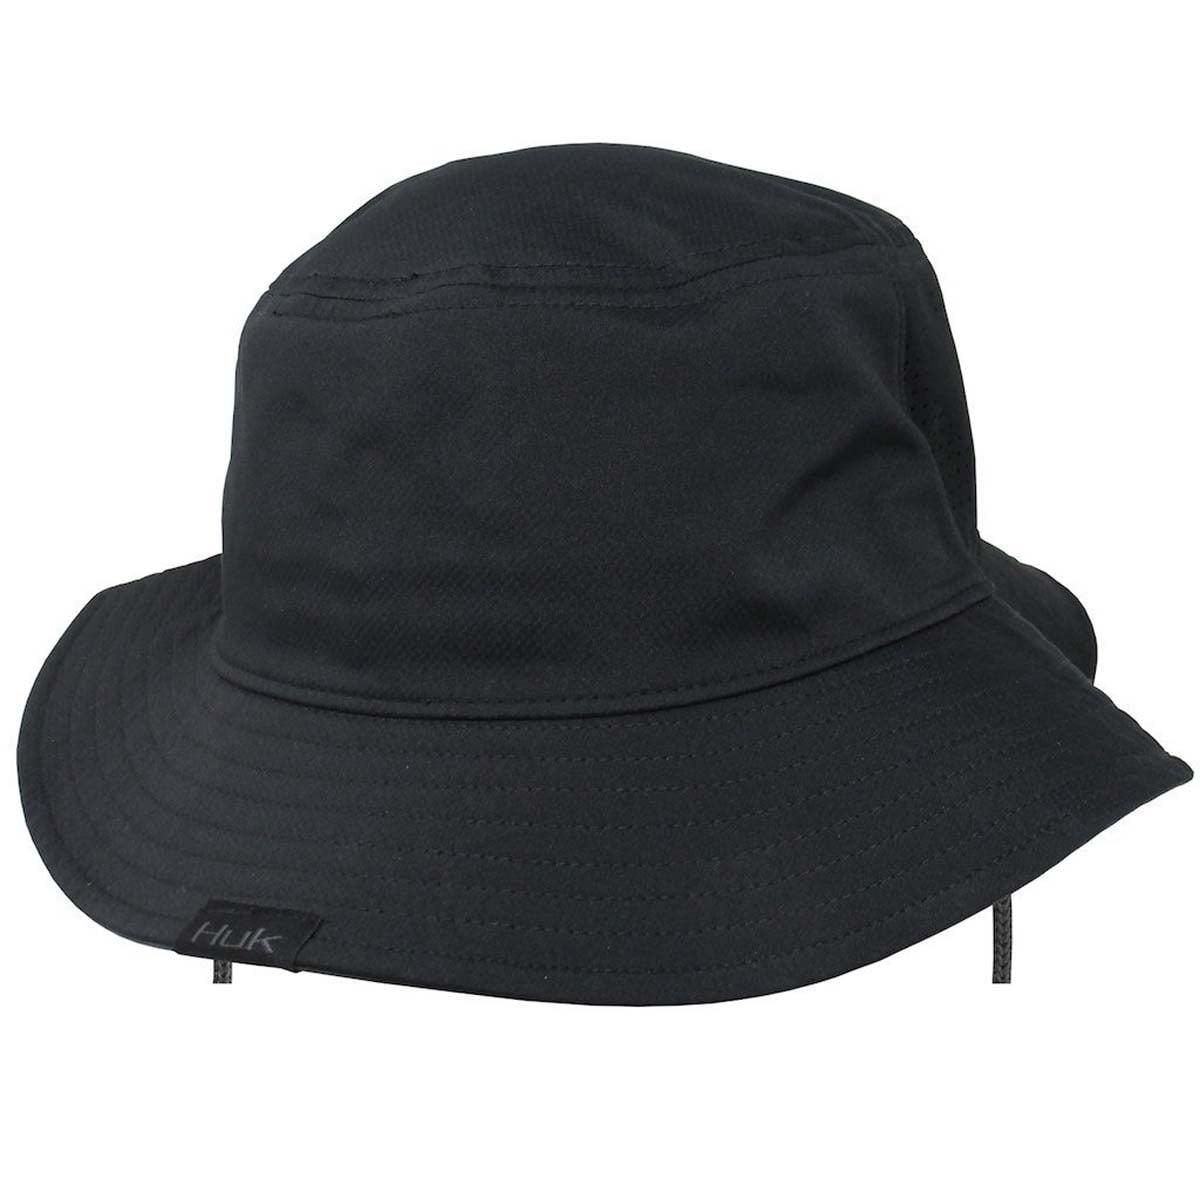 ac306eacda37c HUK BUCKET HAT - Walmart.com